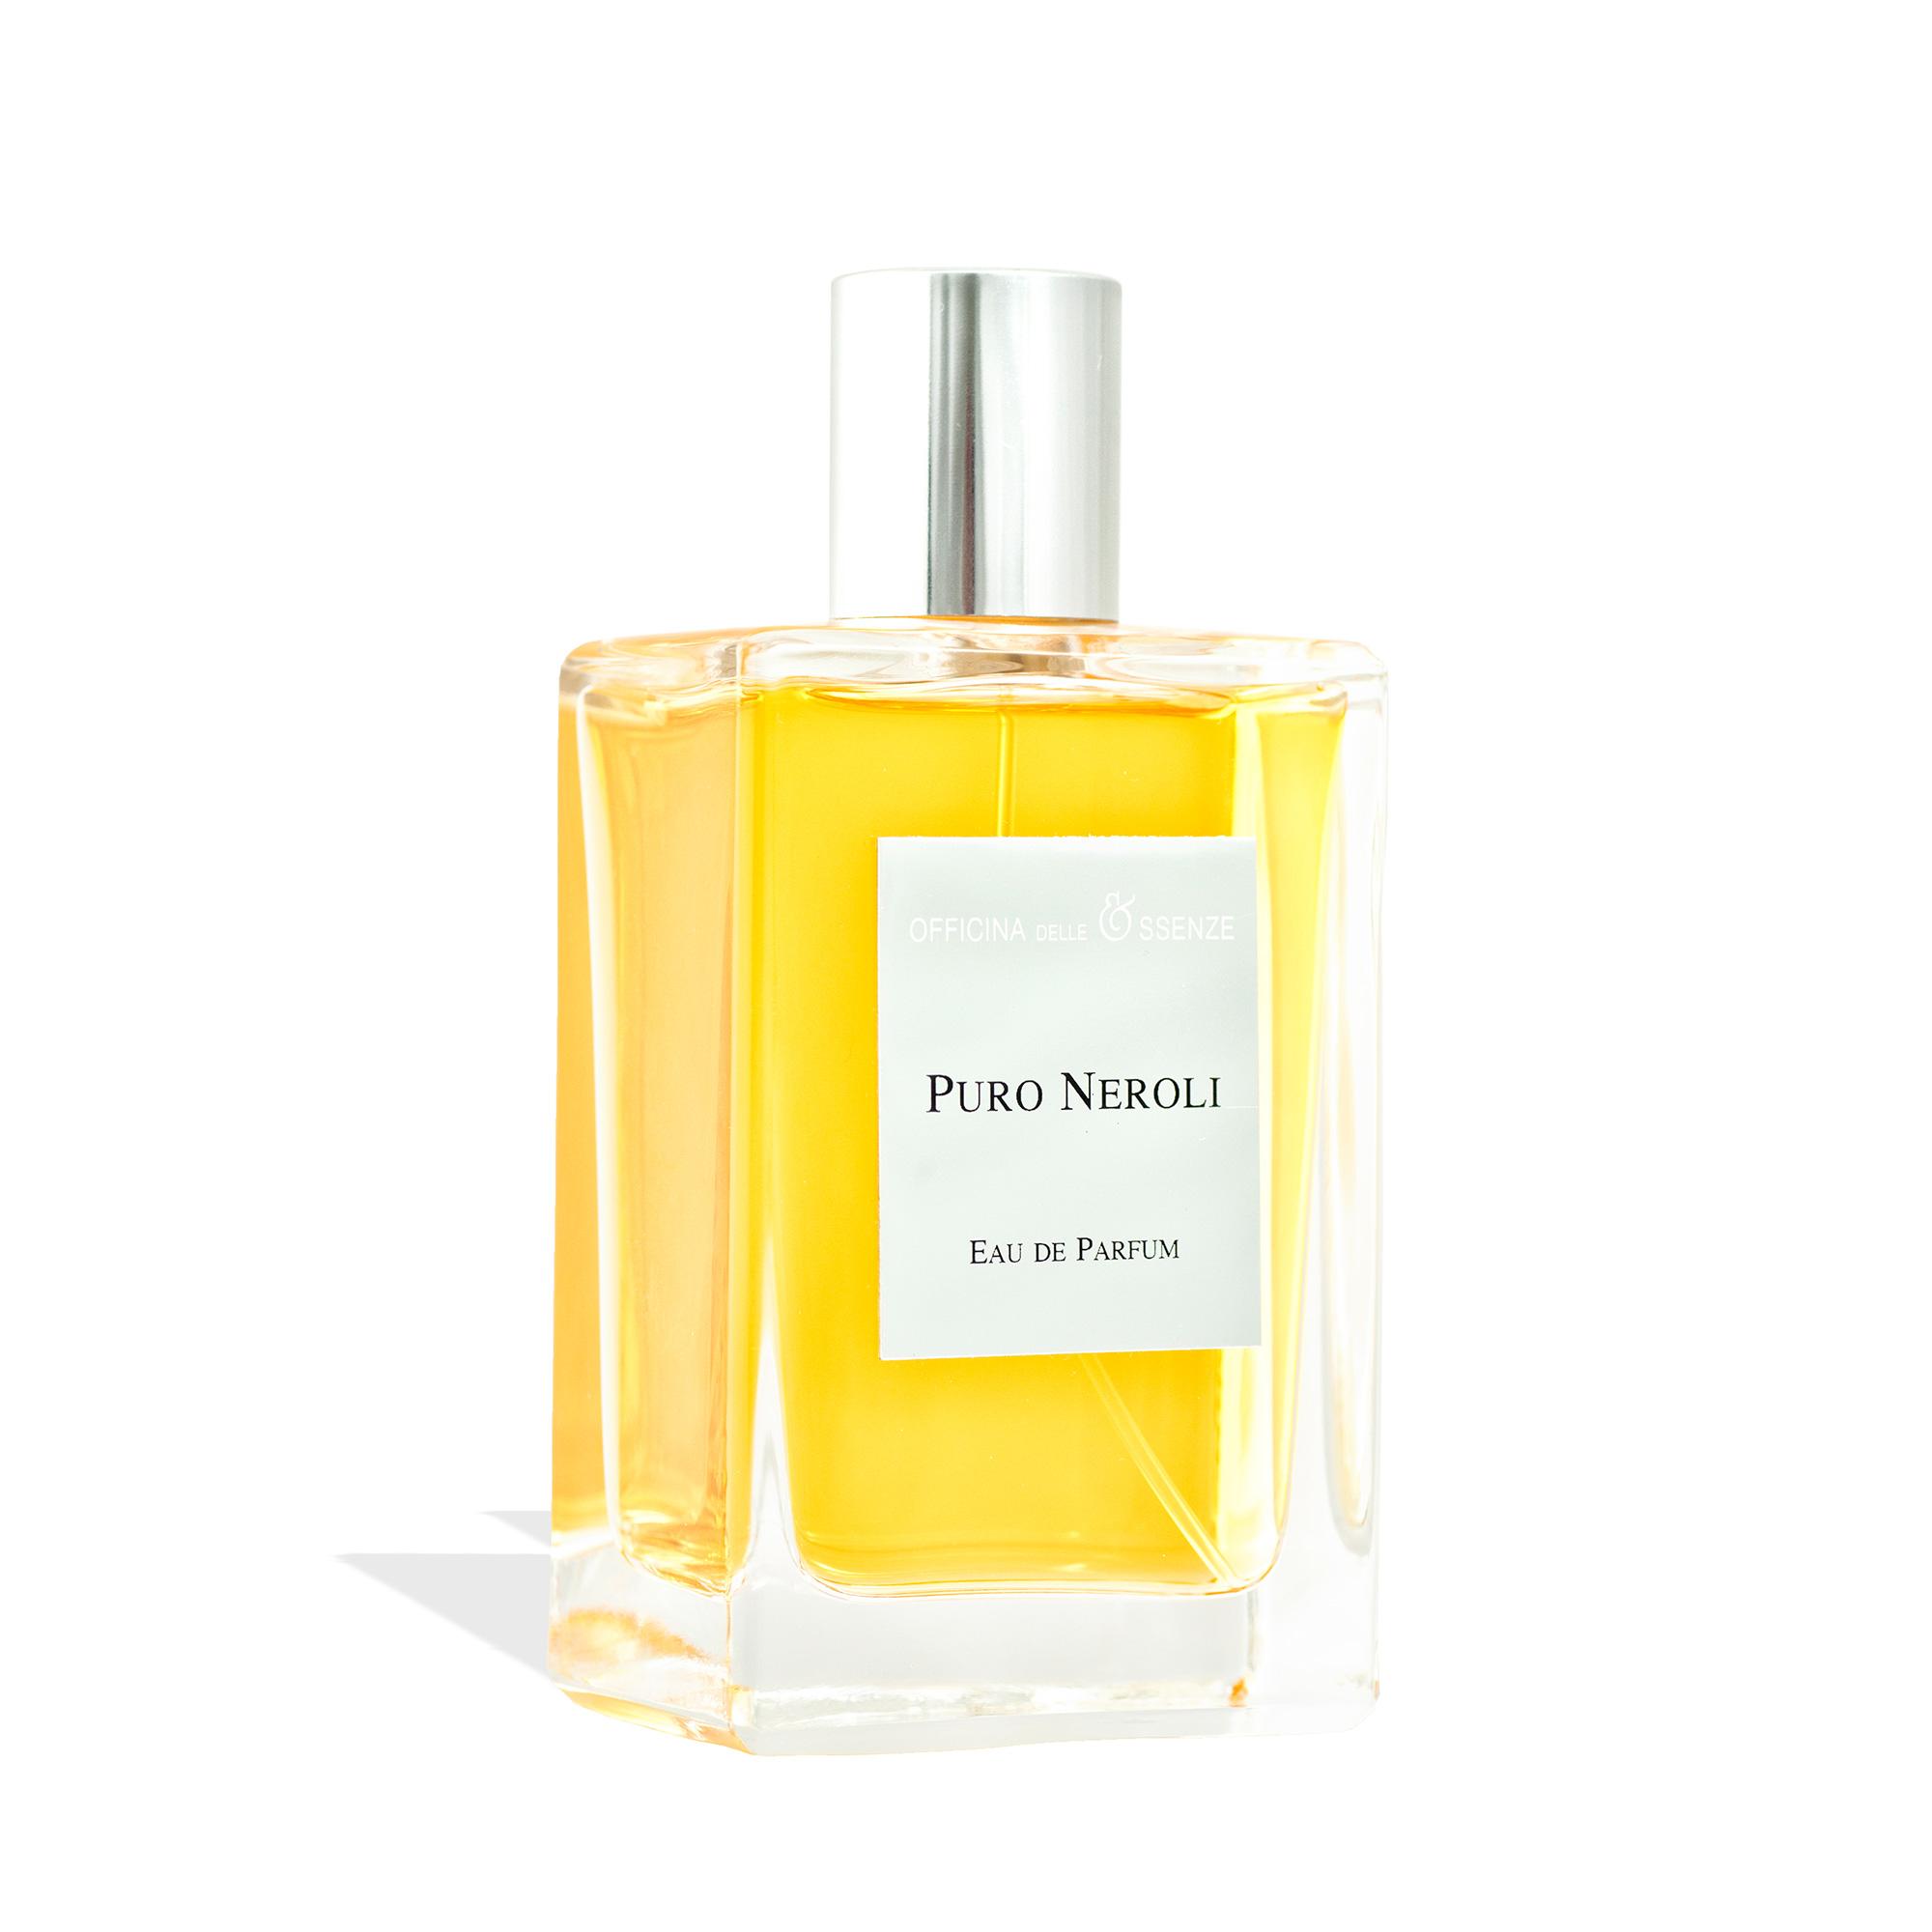 Puro Neroli - Eau de parfum